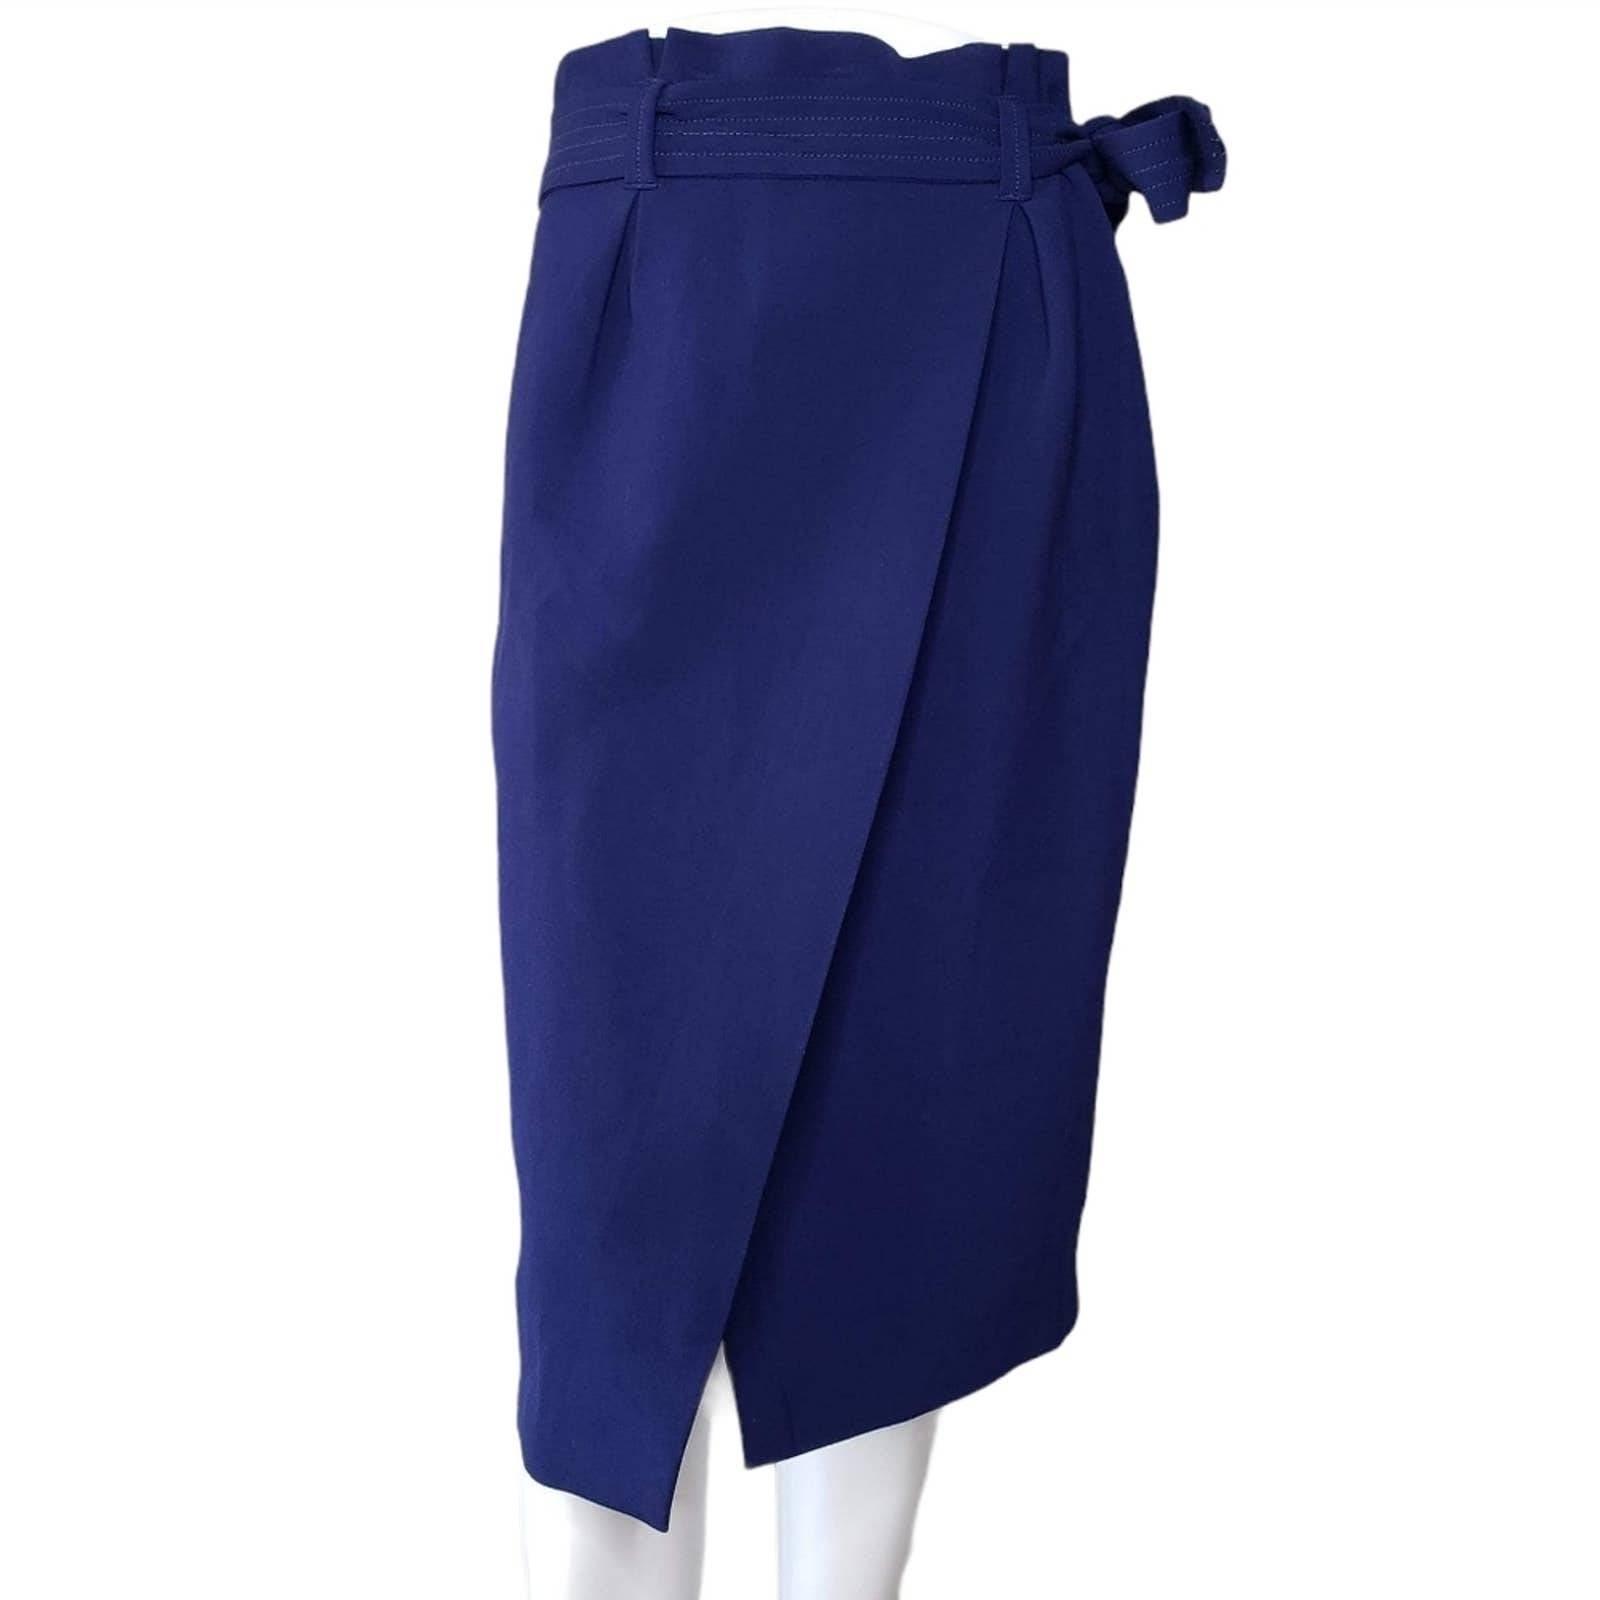 Zara Woman | Navy Faux Wrap Tie Skirt M